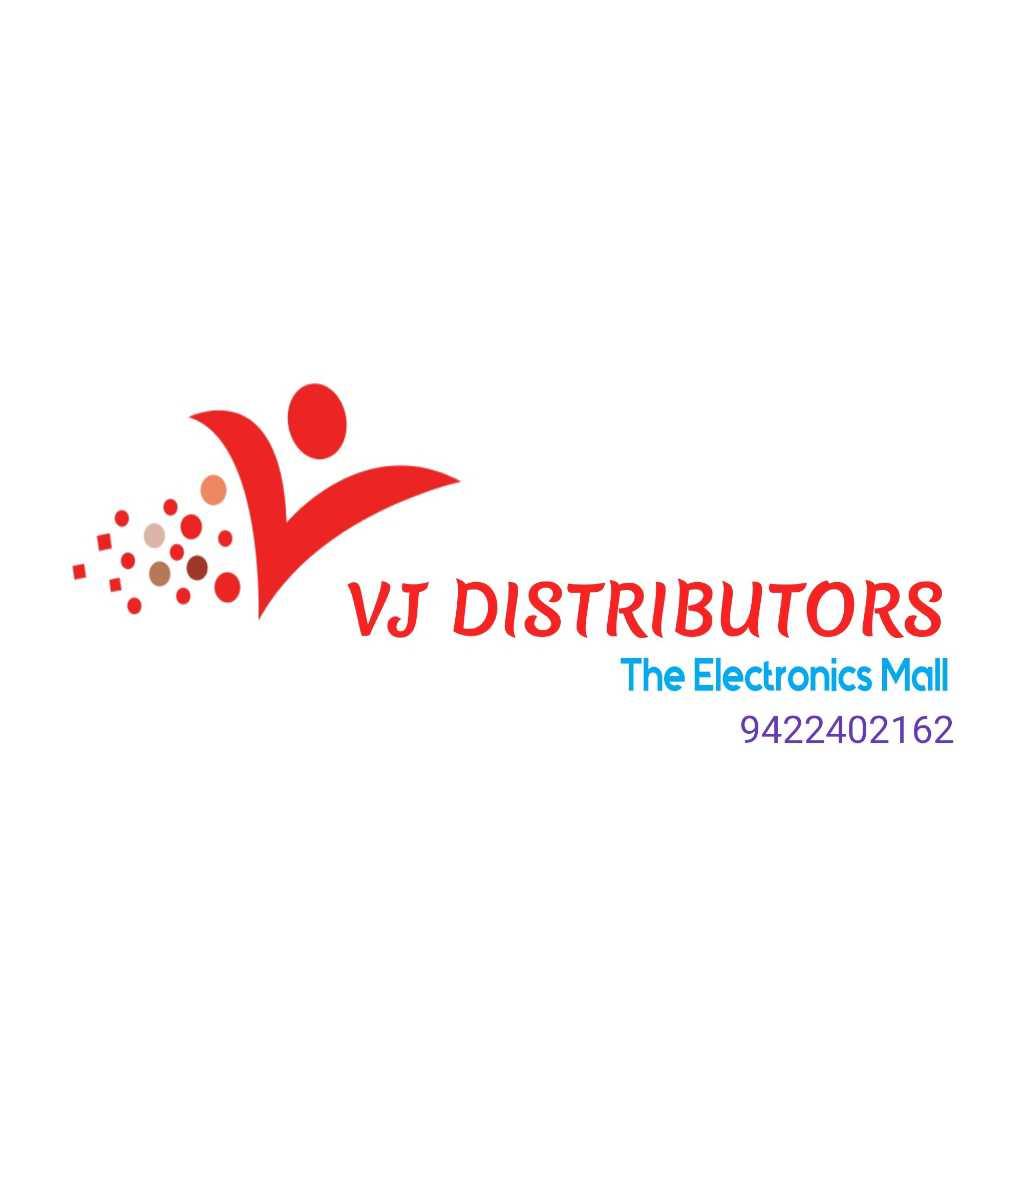 Vj Distributors